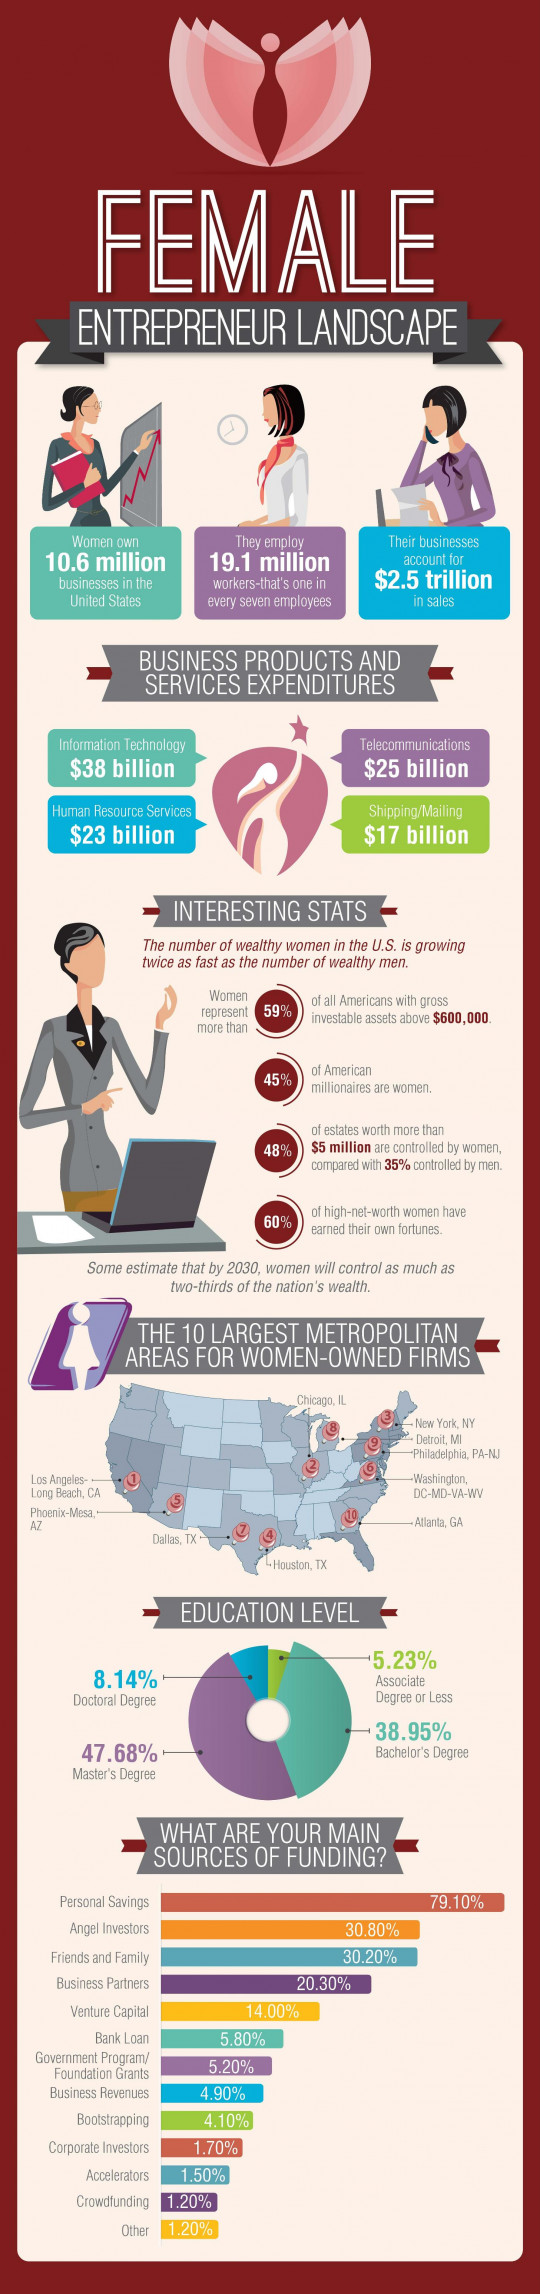 Female Entrepreneur Landscape